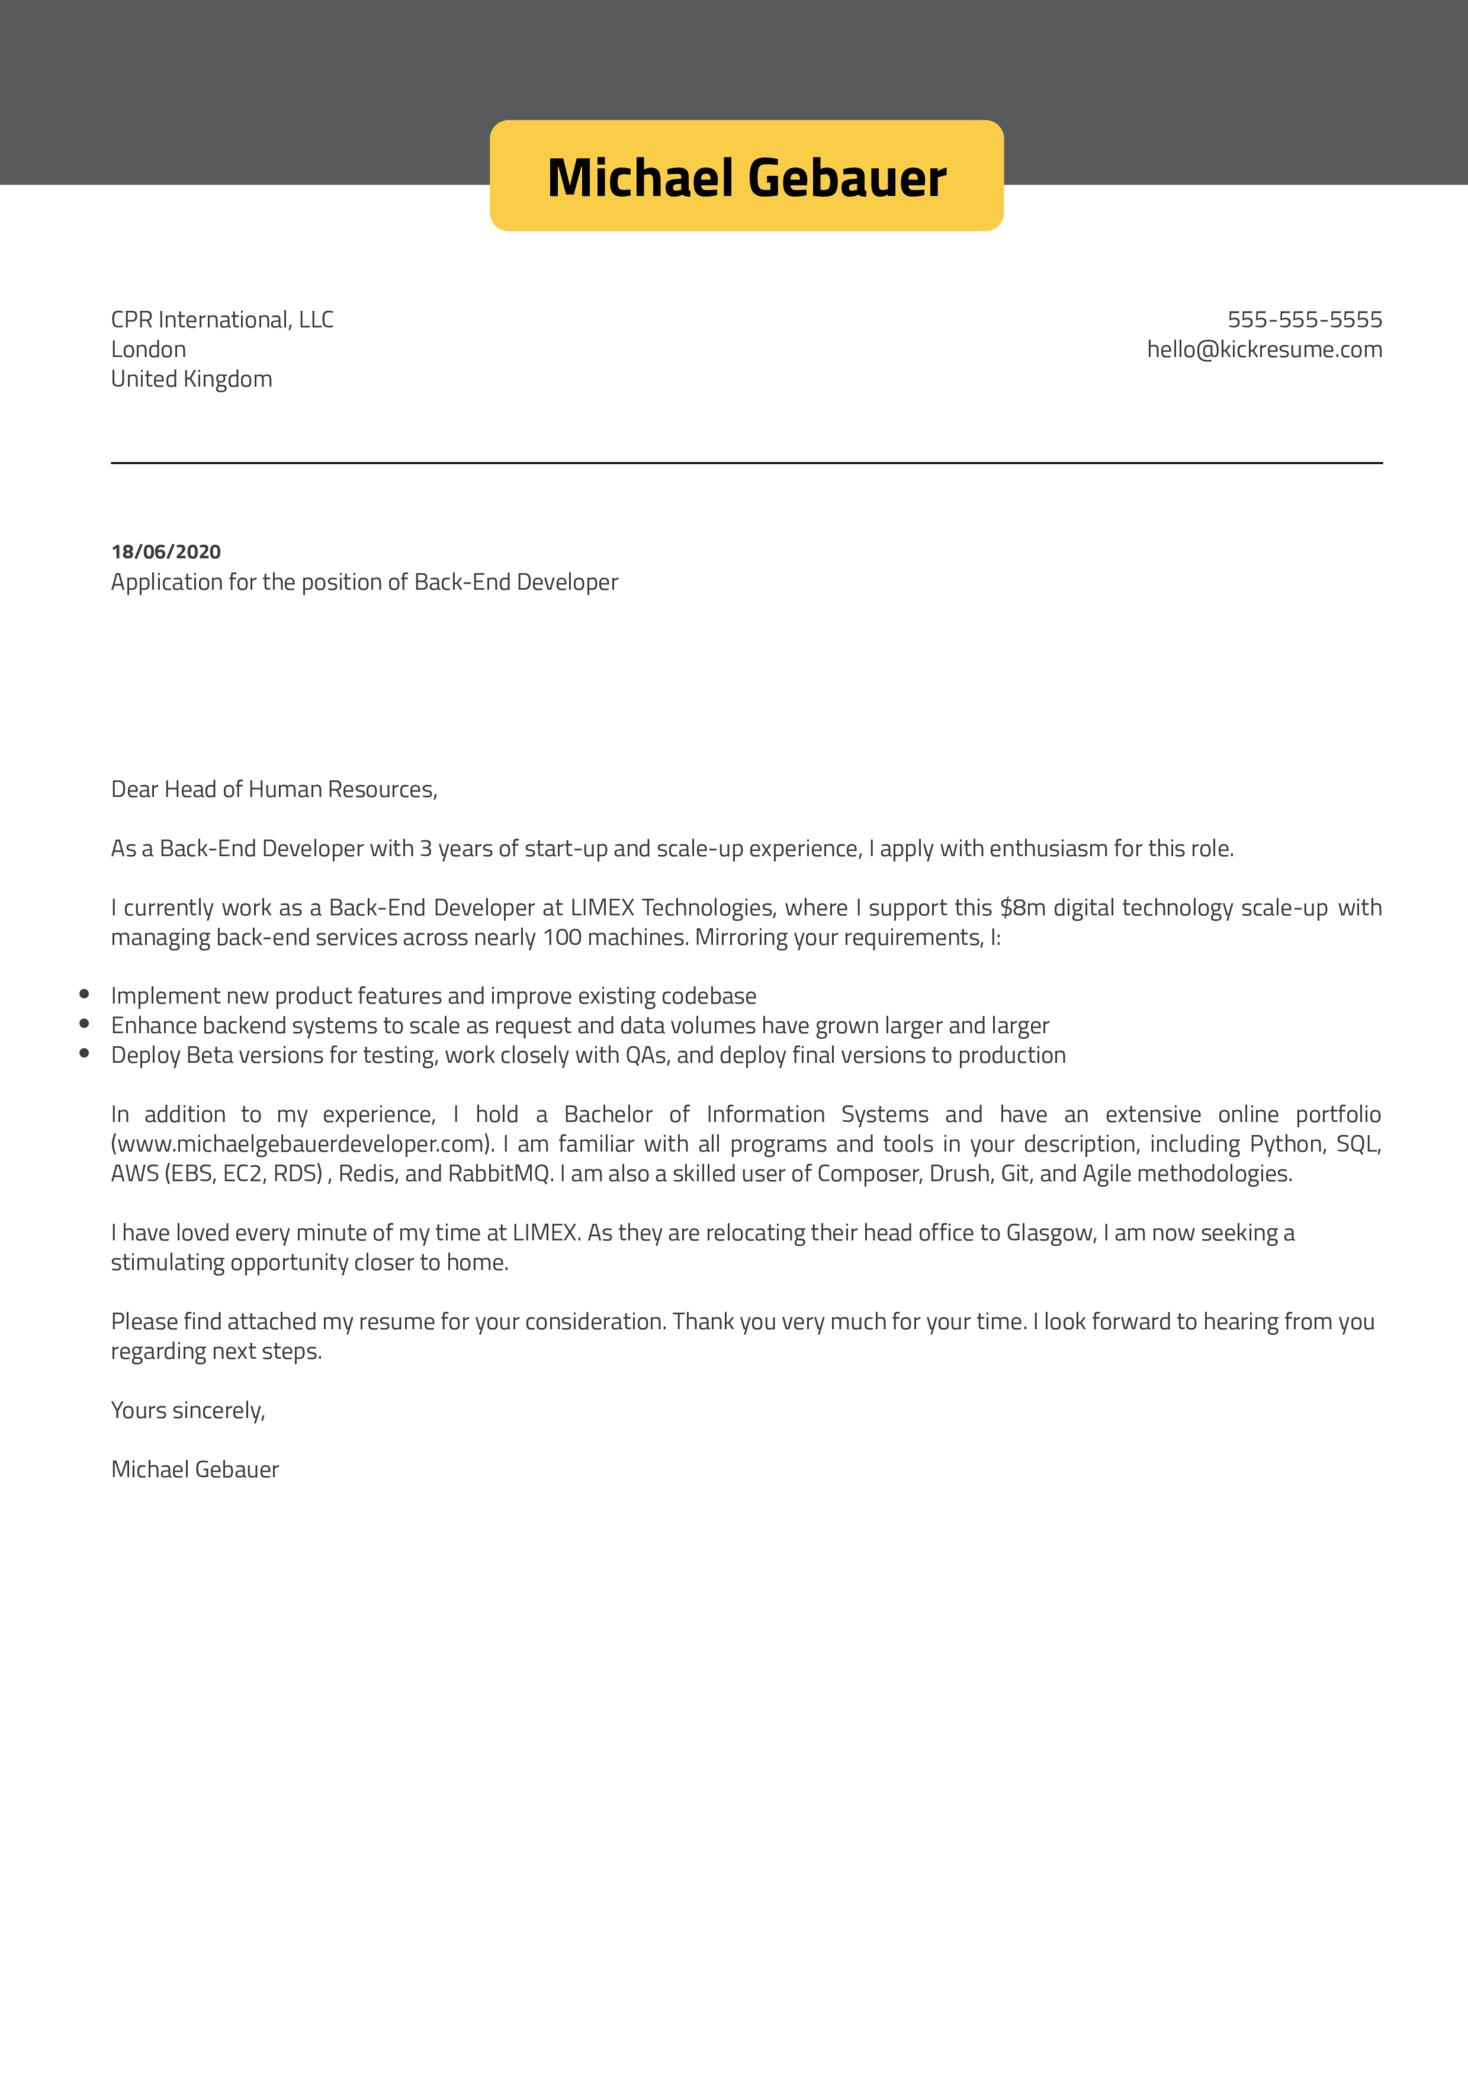 Back-end Developer Cover Letter Example